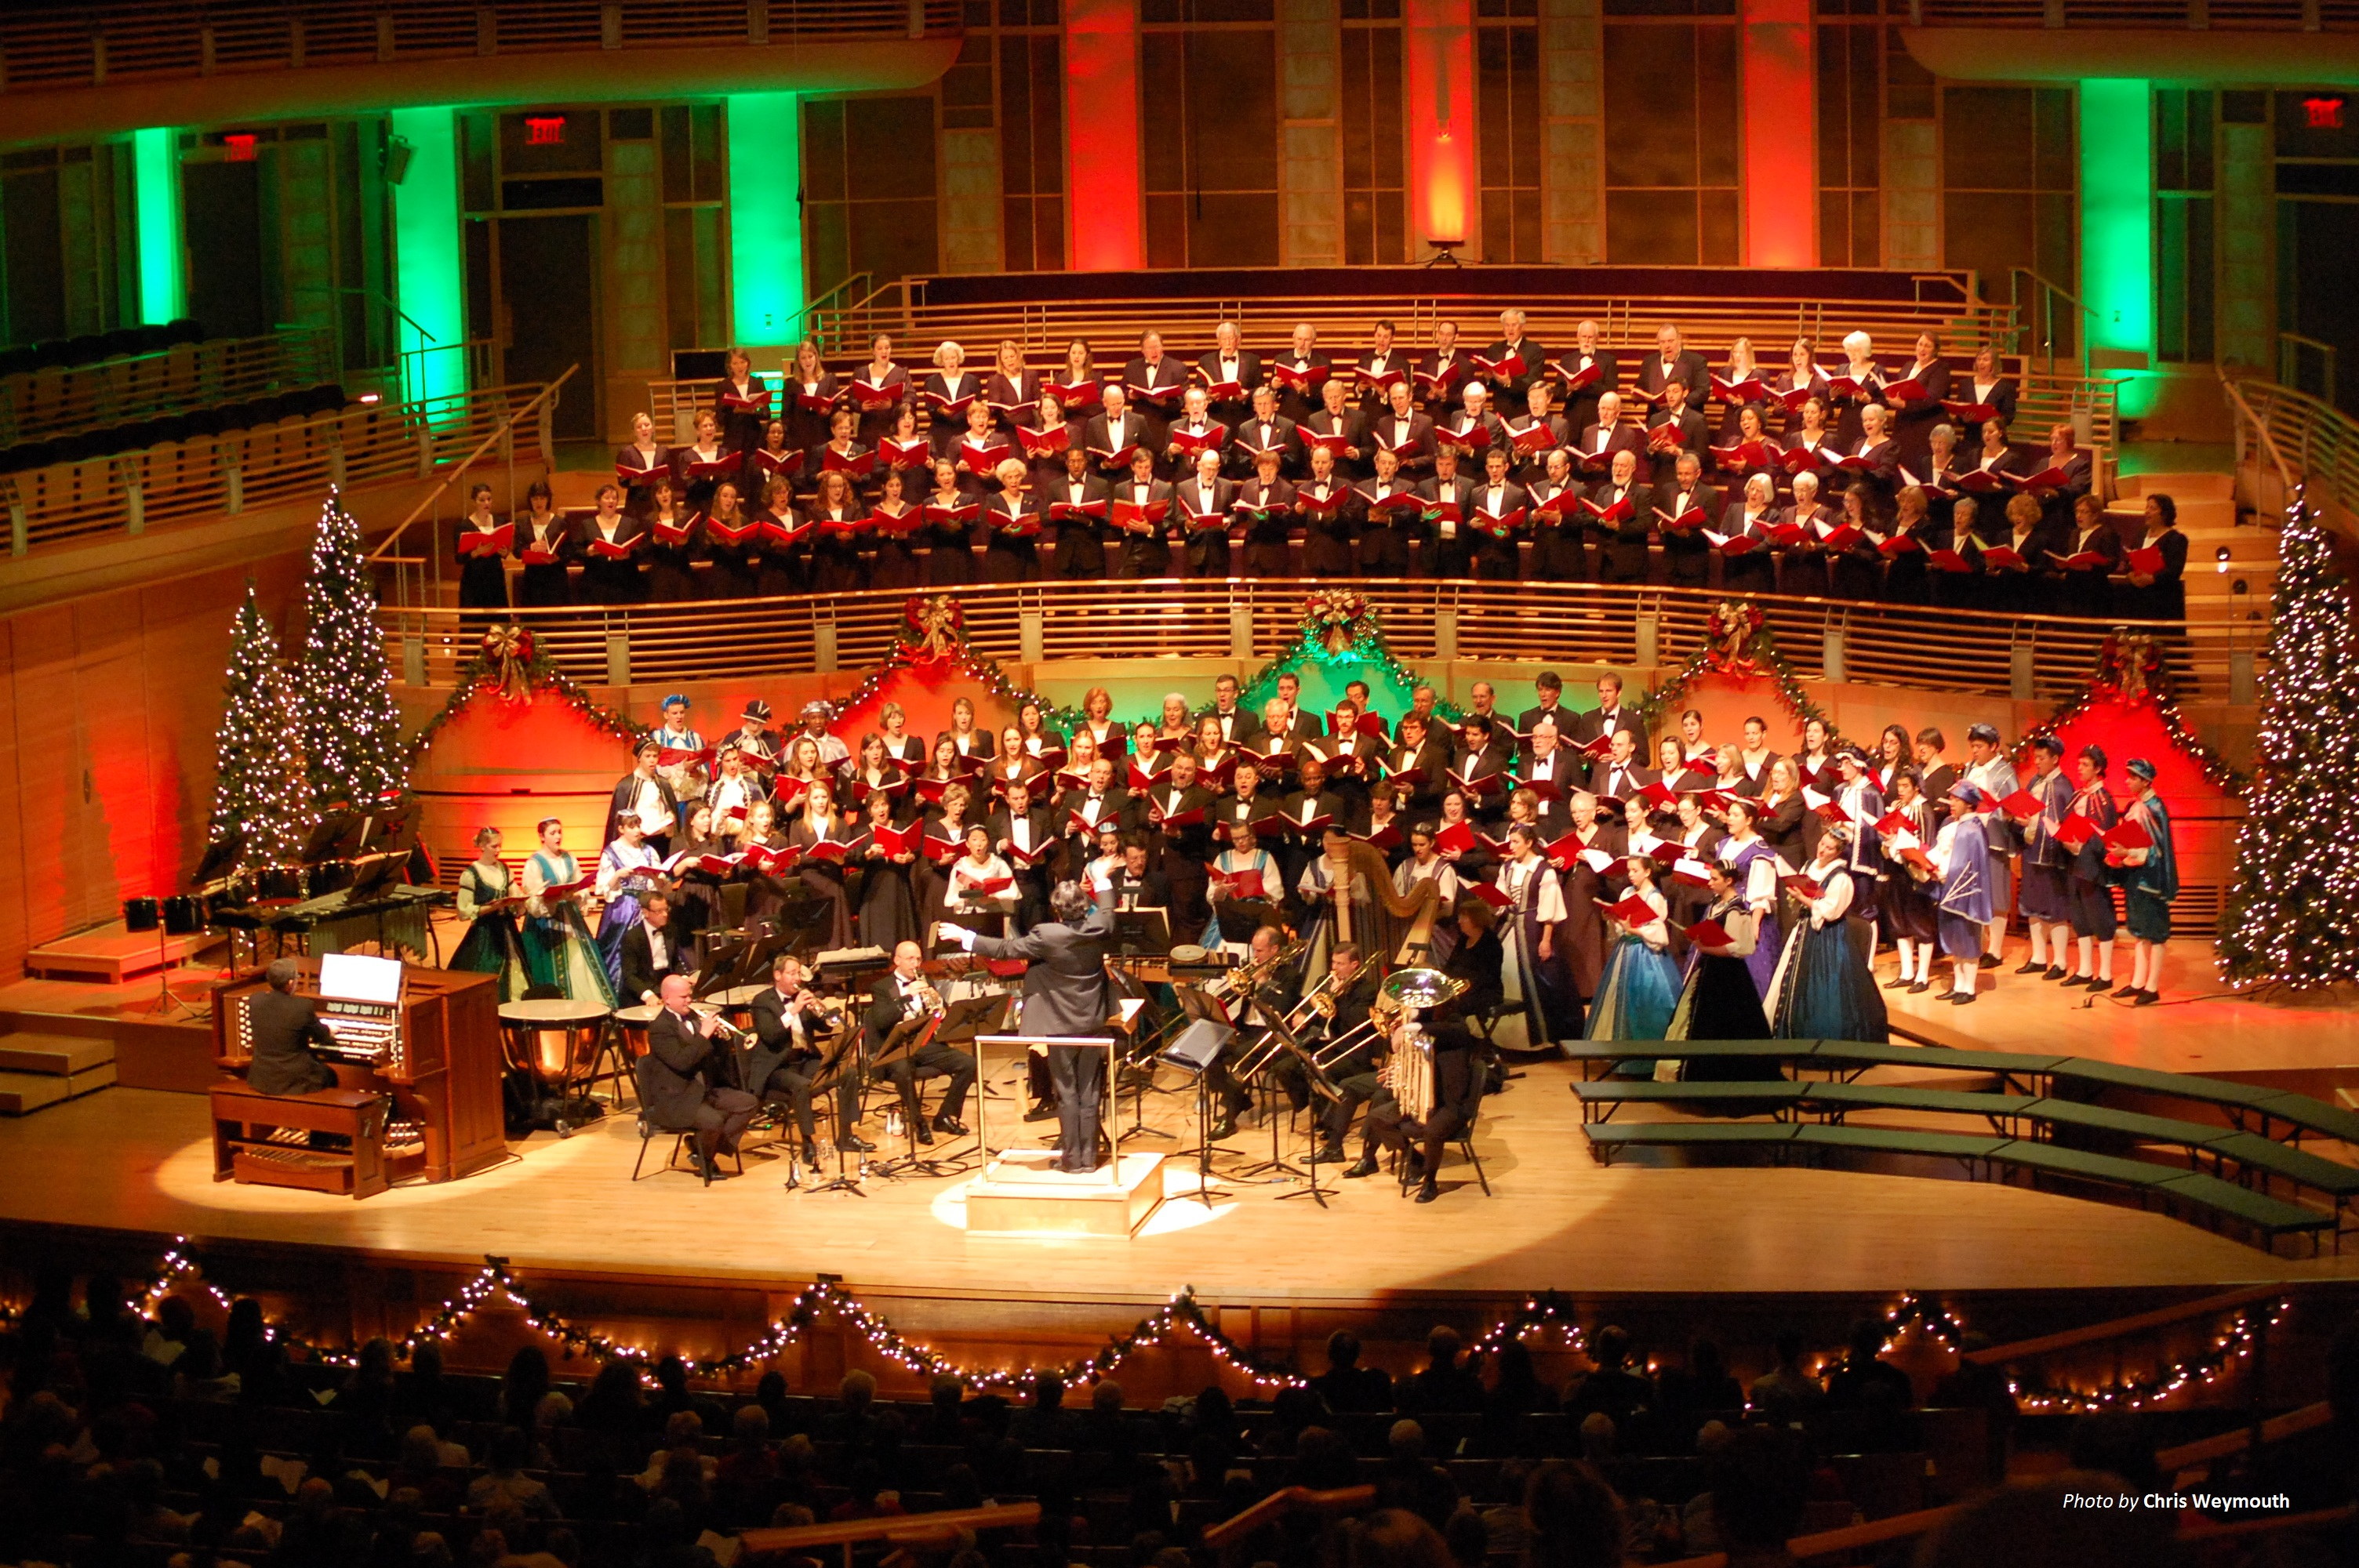 Washington Chorus Christmas Concerts 2020 The Washington Chorus presents six Candlelight Christmas concerts